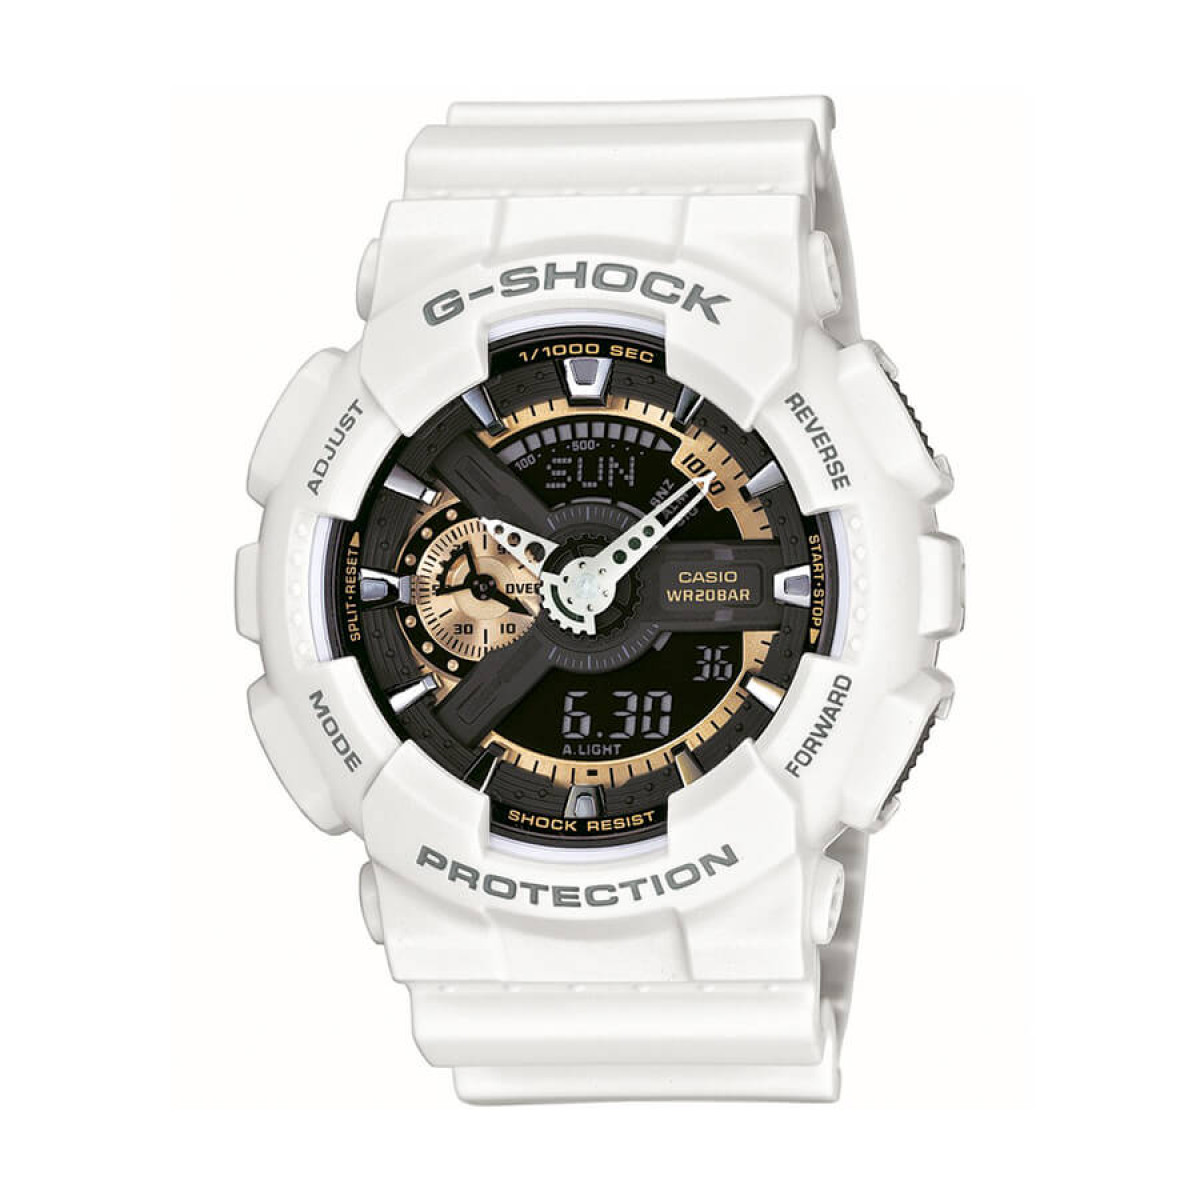 Часовник Casio G-Shock GA-110RG-7AER